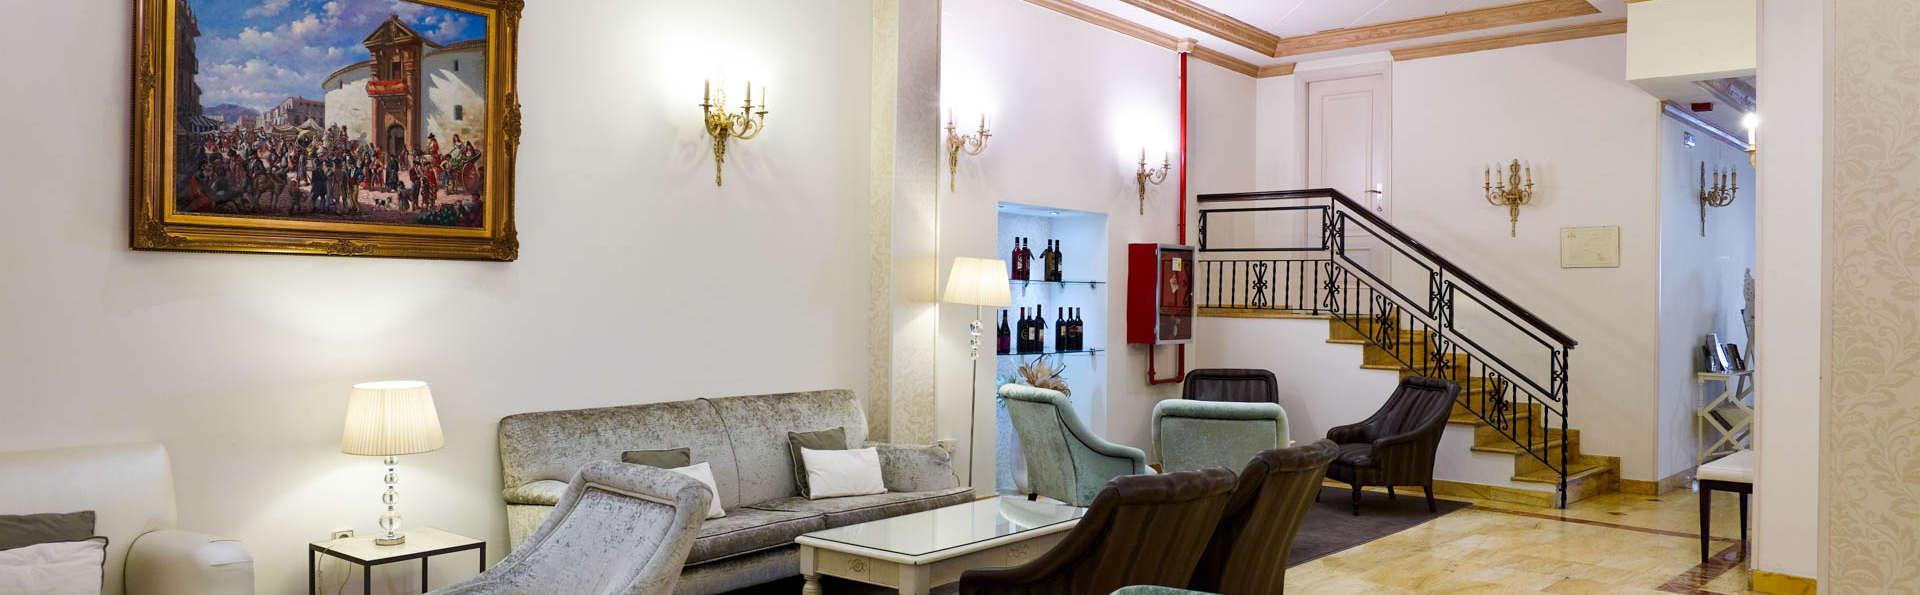 Hotel Maestranza Ronda - EDIT_LOOBY.jpg